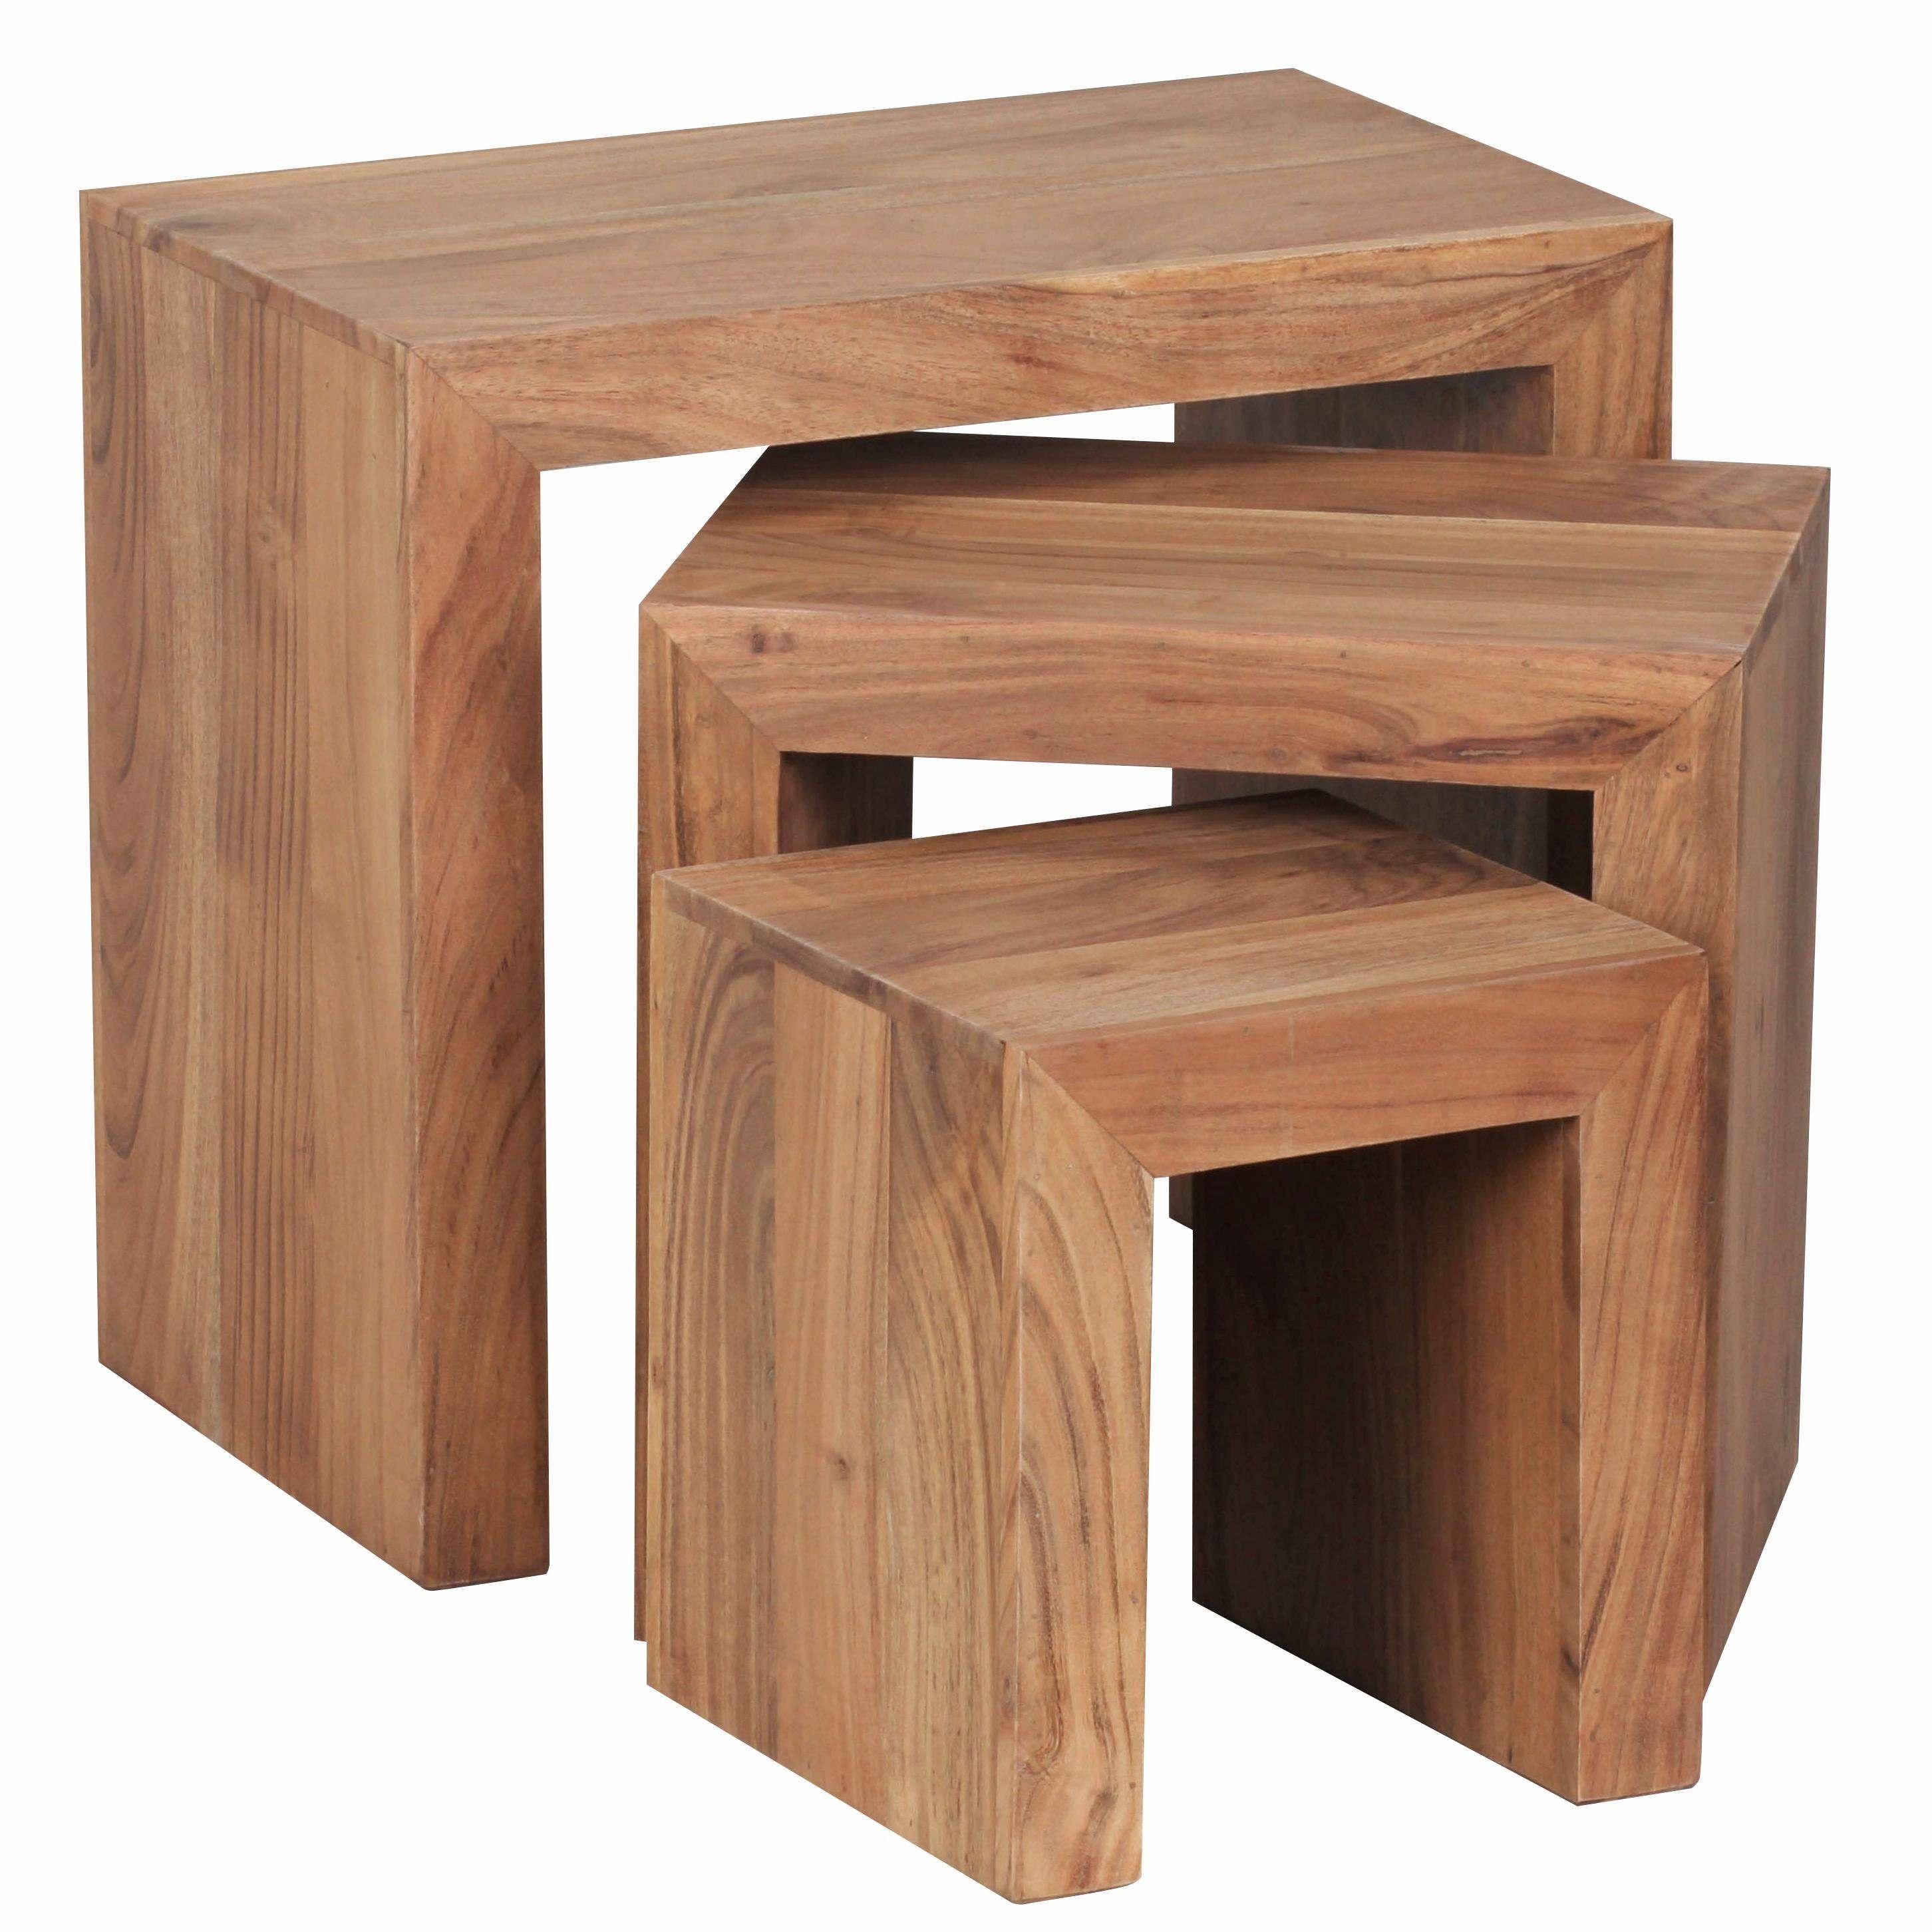 Home Affaire Beistelltisch Trayee Beige Fsc Zertifiziert Jetzt Bestellen Unter Https Moebel Ladendirekt De Wohnz Beistelltische Beistelltisch Holz Tisch